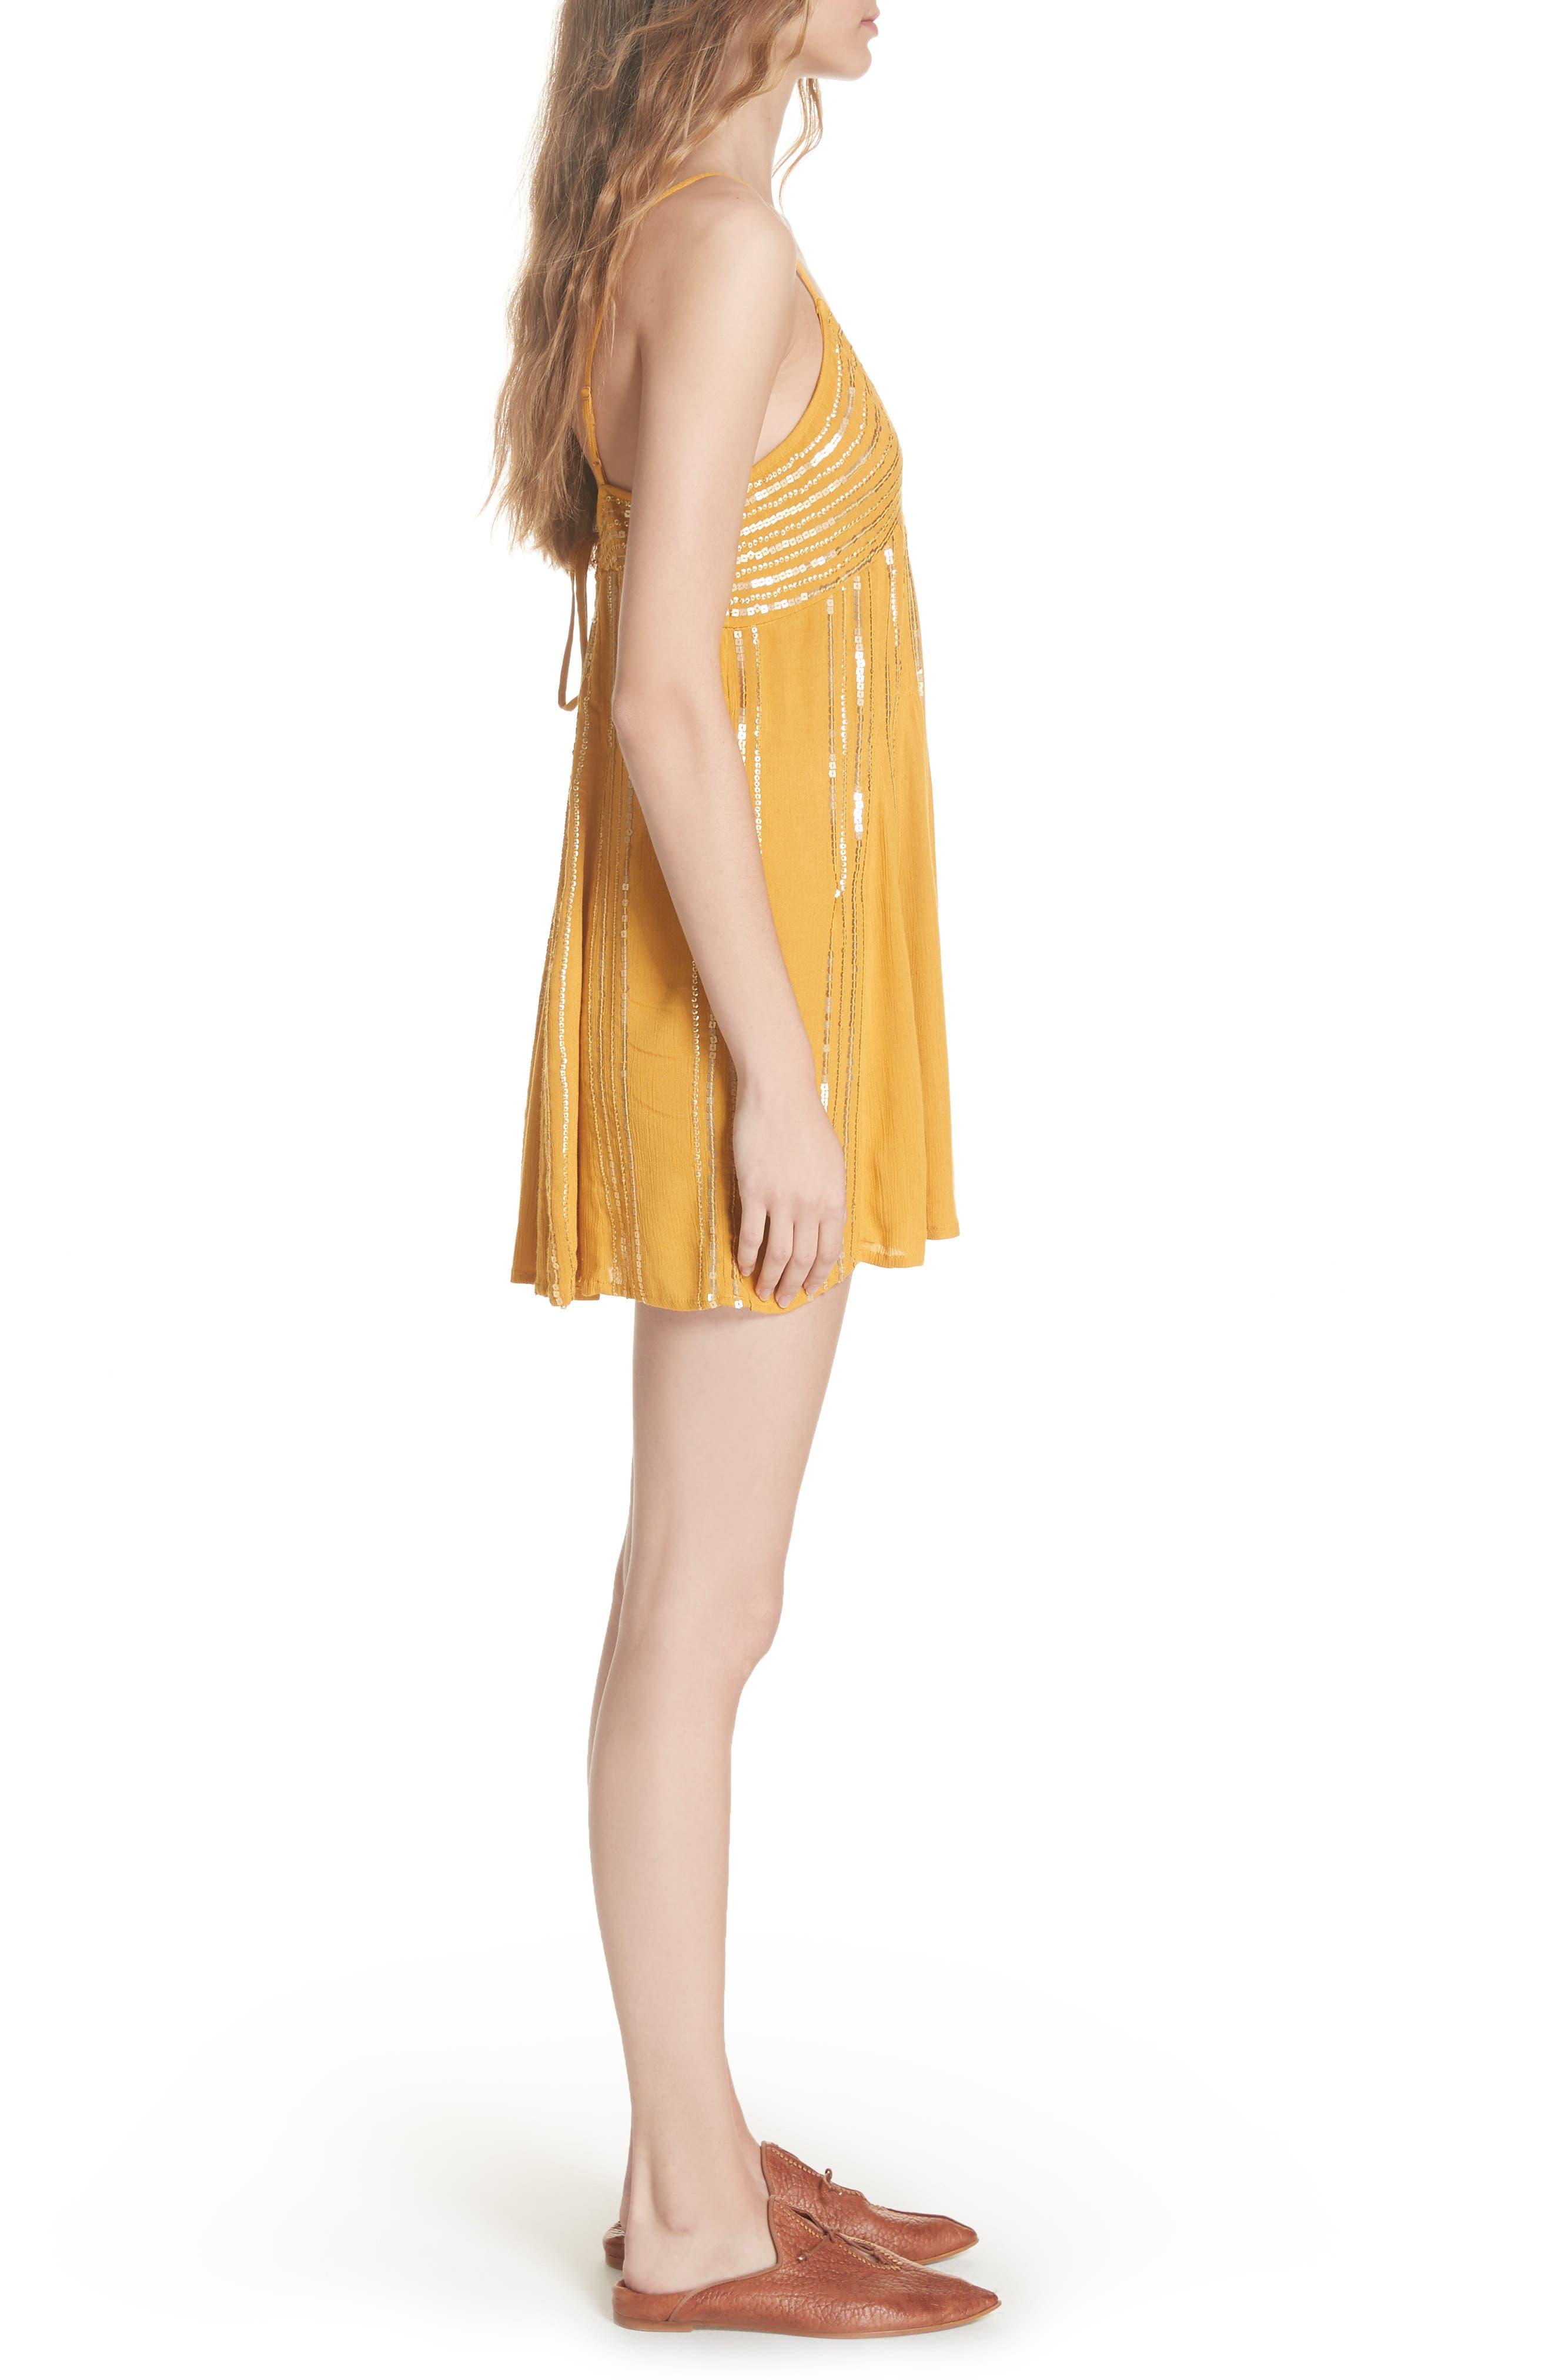 Here She Is Embellished Swing Minidress,                             Alternate thumbnail 3, color,                             710